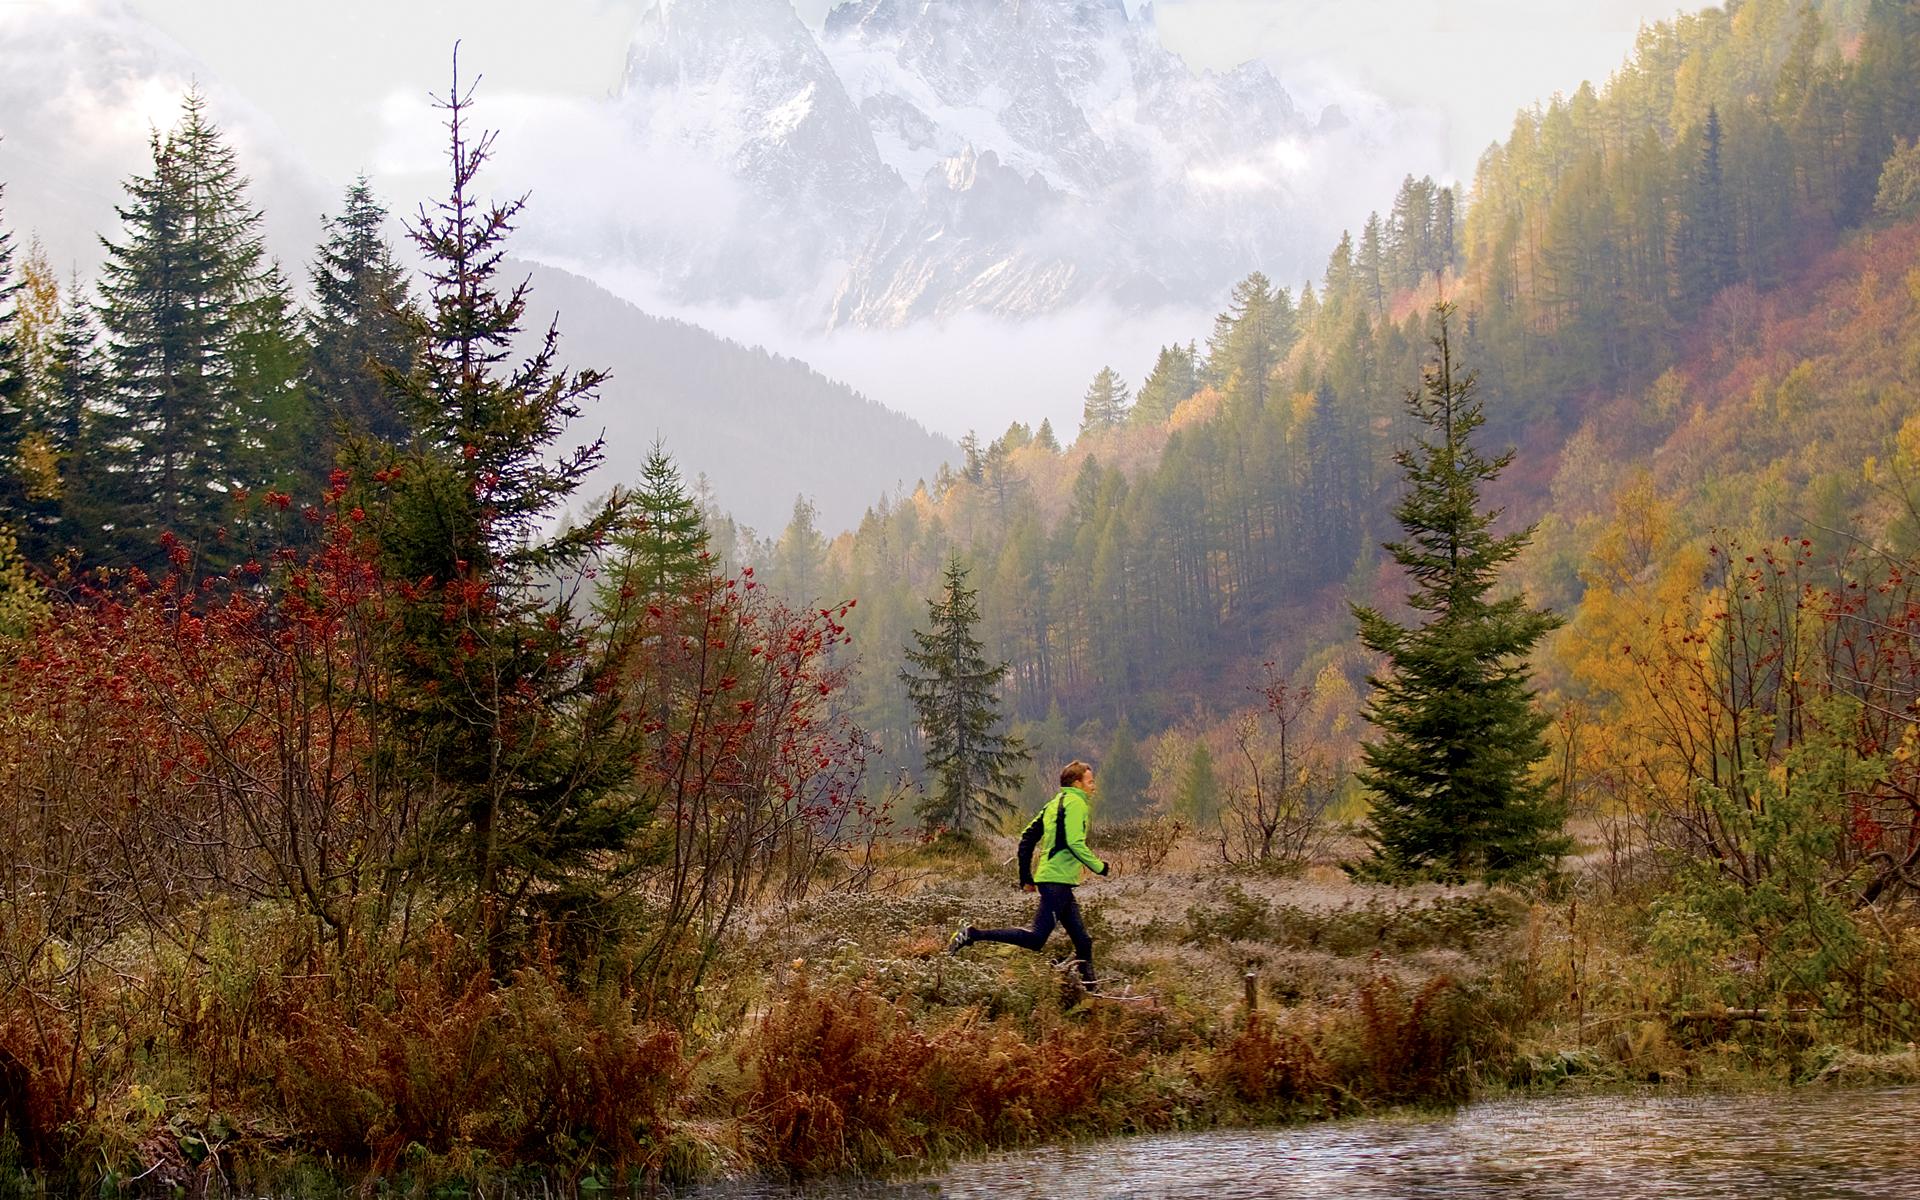 Rave Run Chamonix France Runners World 1920x1200